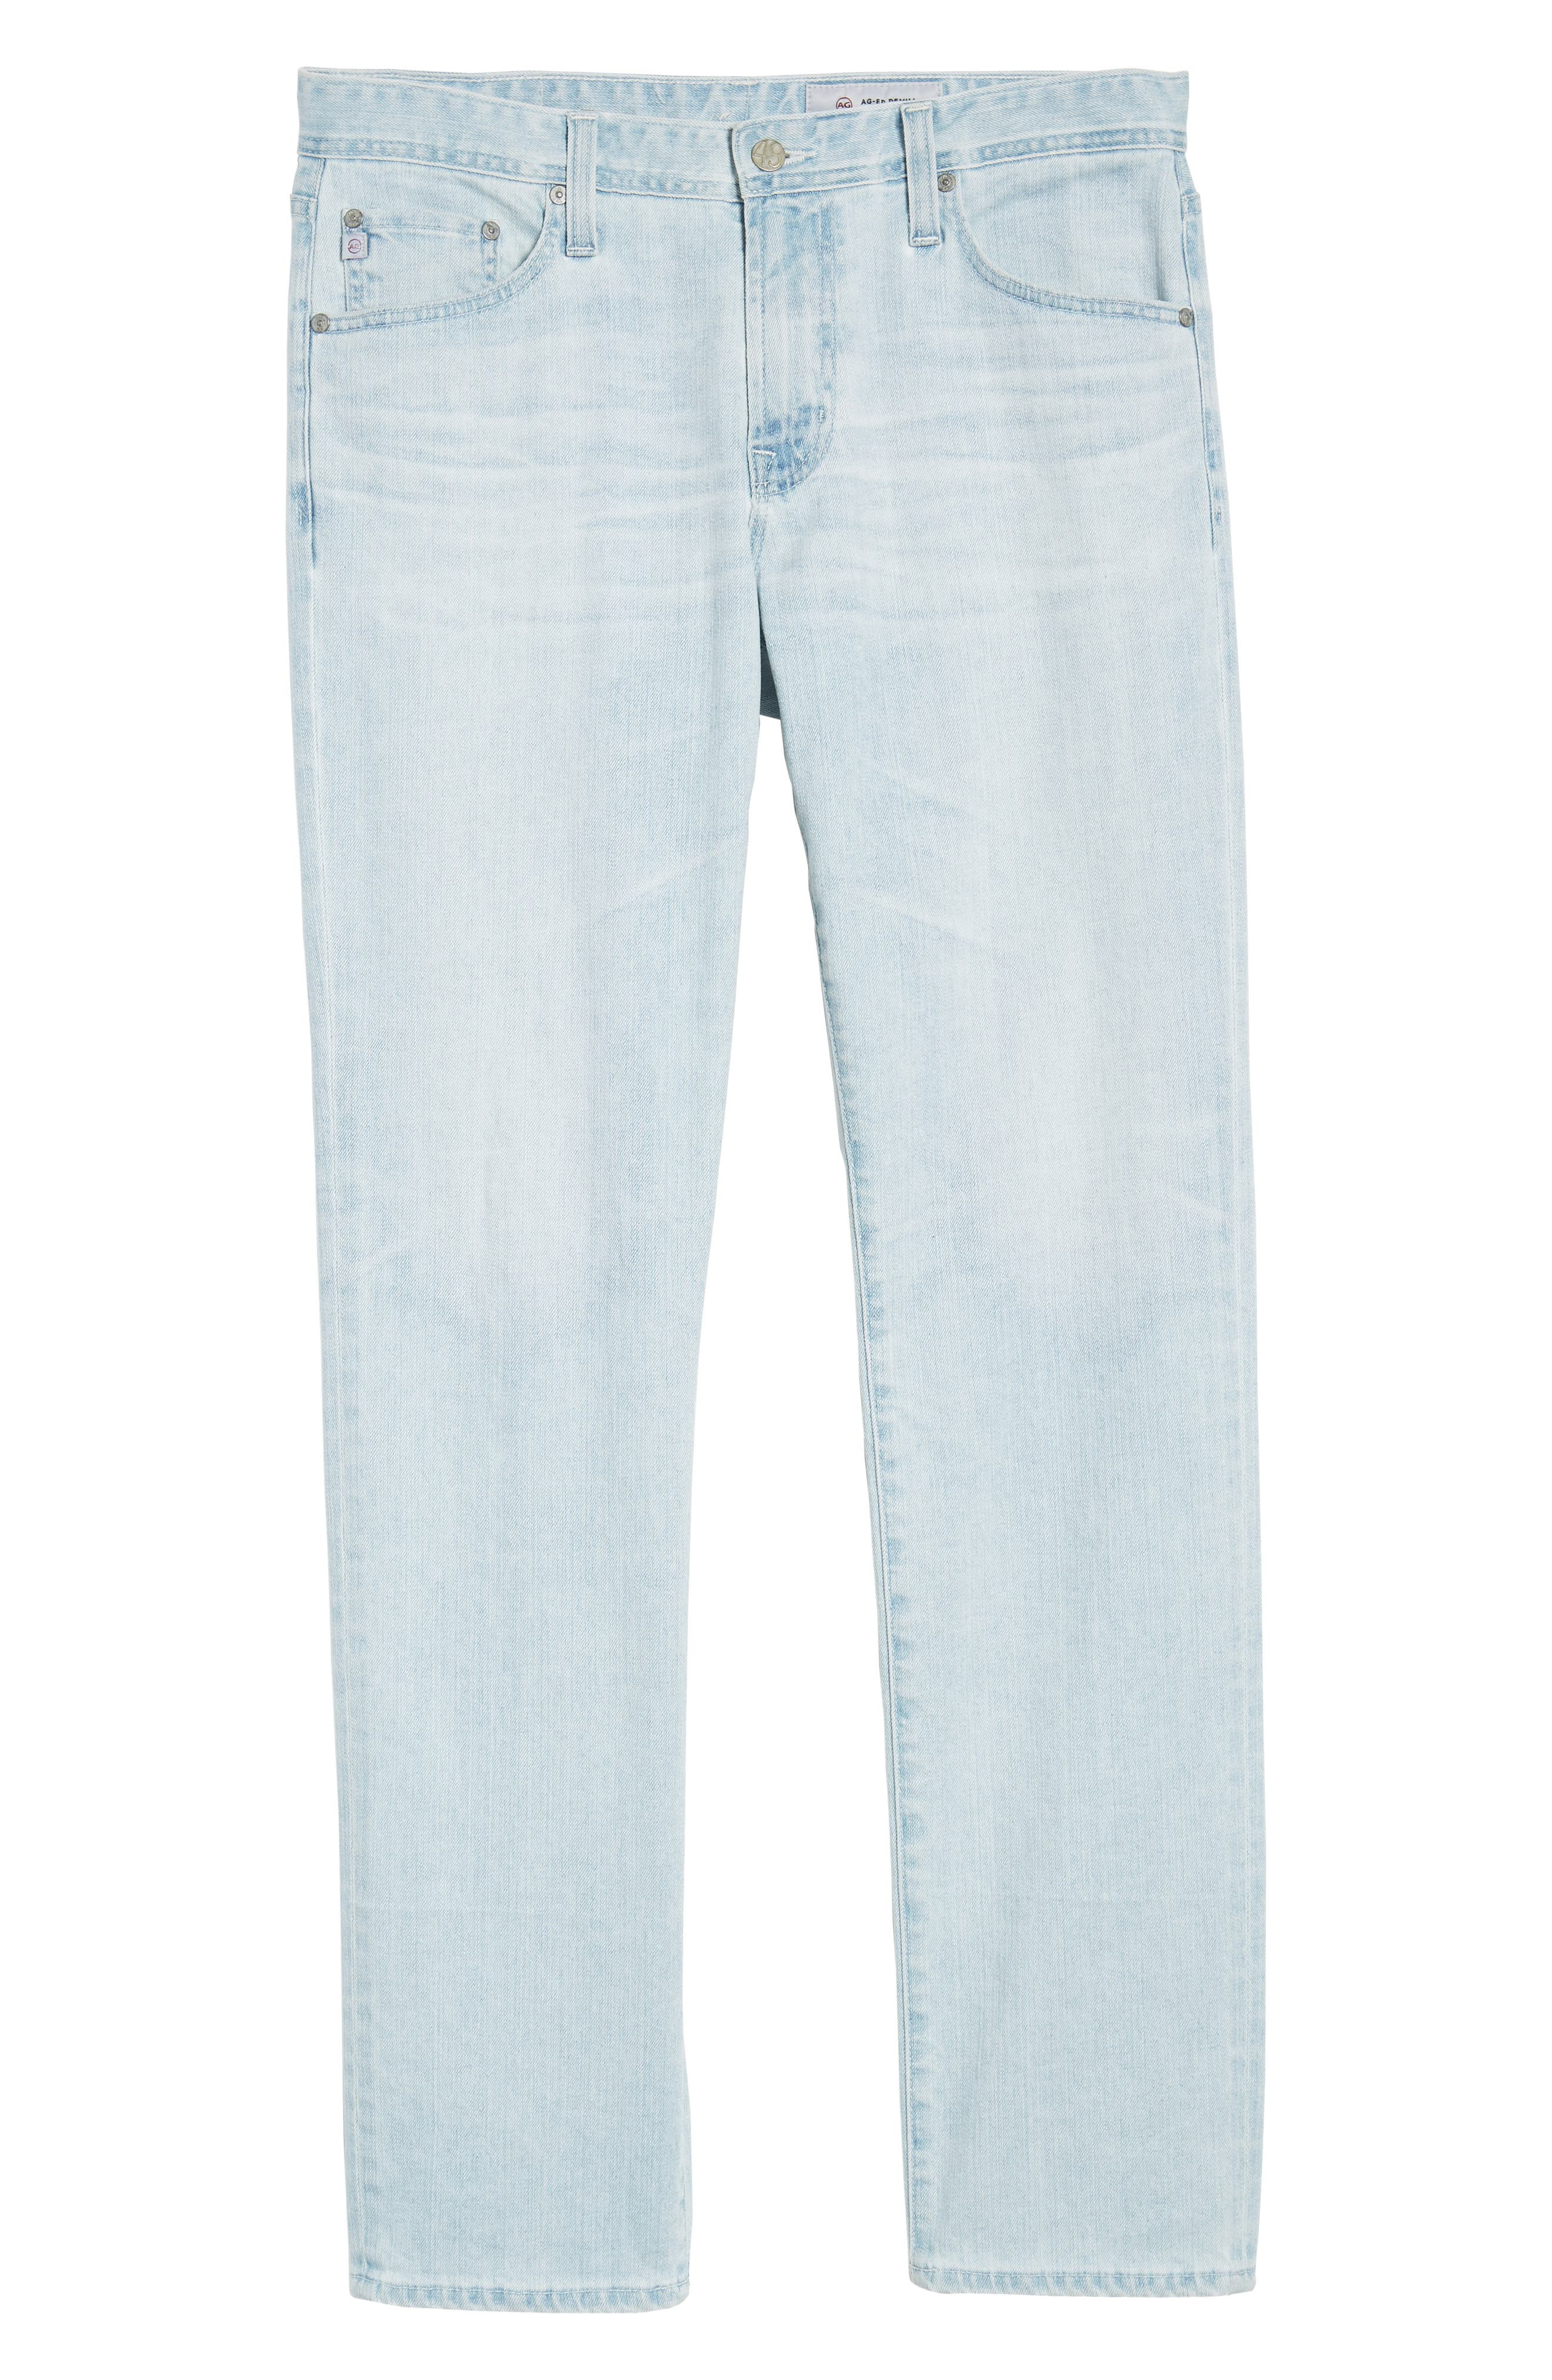 Graduate Slim Straight Leg Jeans,                             Alternate thumbnail 6, color,                             27 Years Bayside